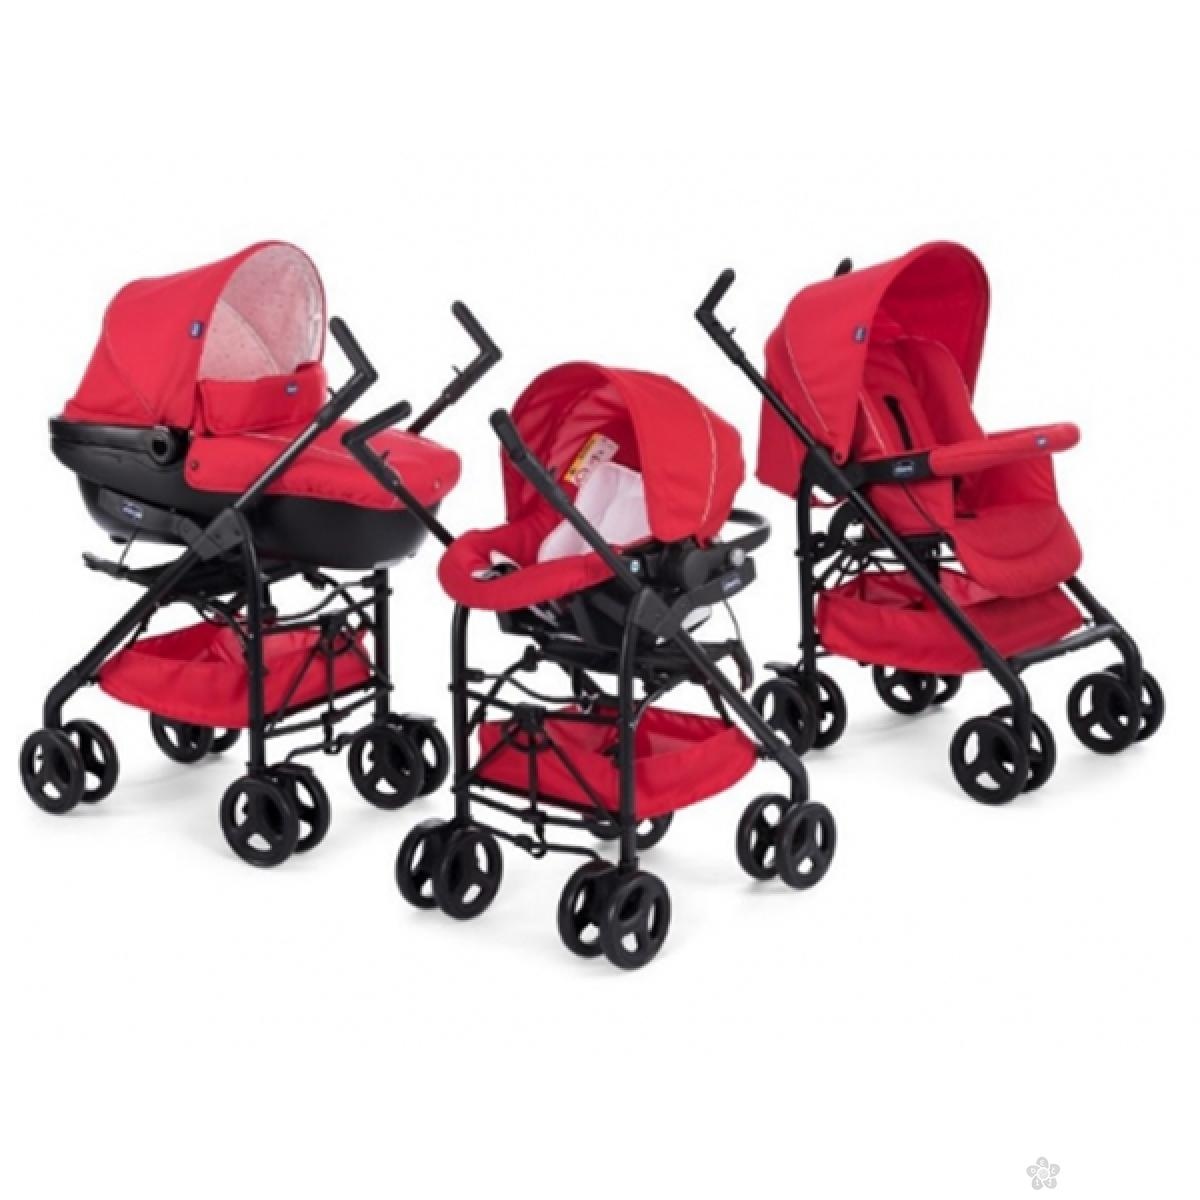 Trio Sprint Chicco red passion-crveni (kolica+autosedište+nosiljka),5050105